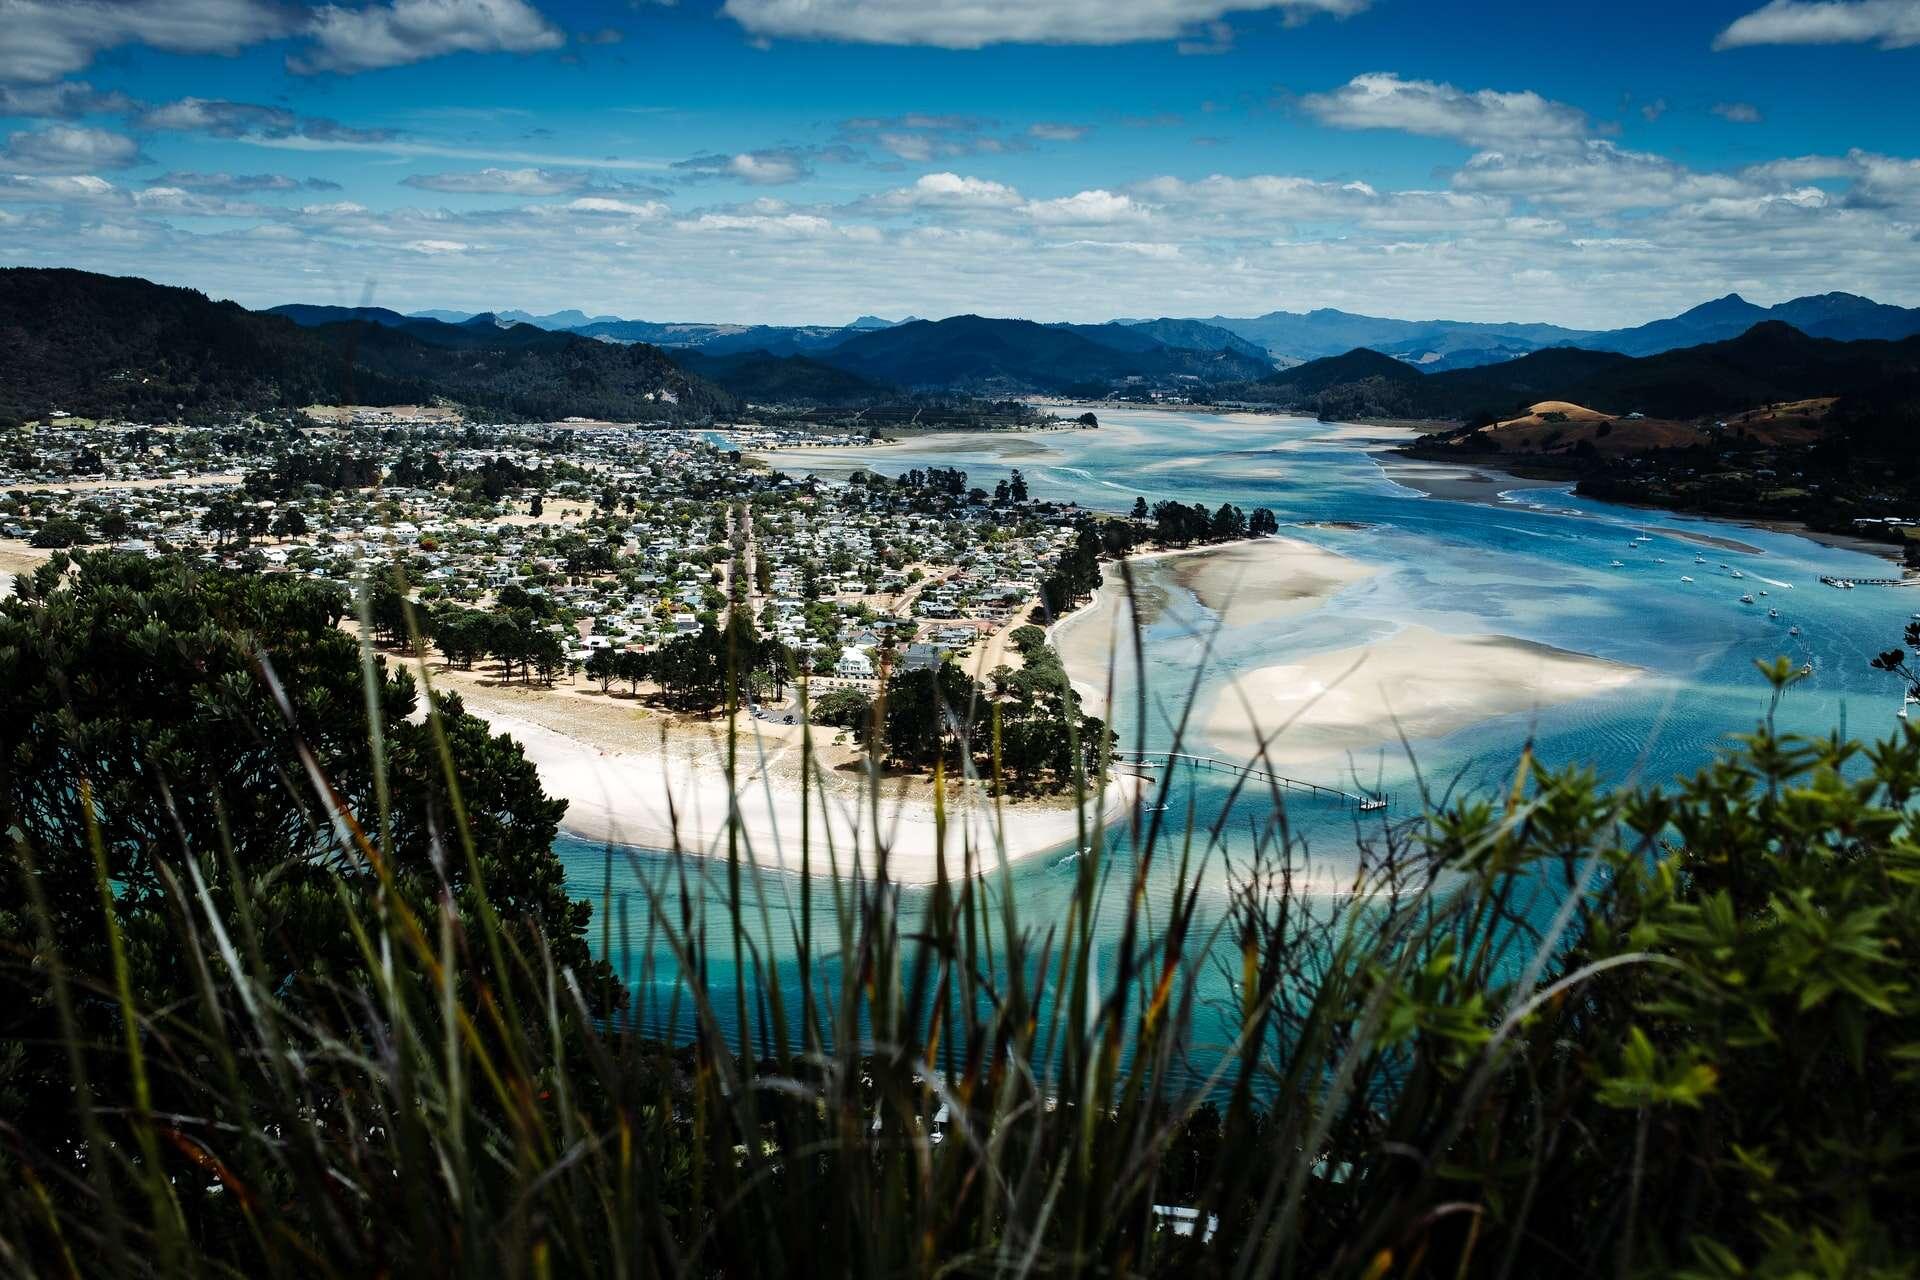 February 27th — Coromandel – Pacific Harbour Tairua – 1 night